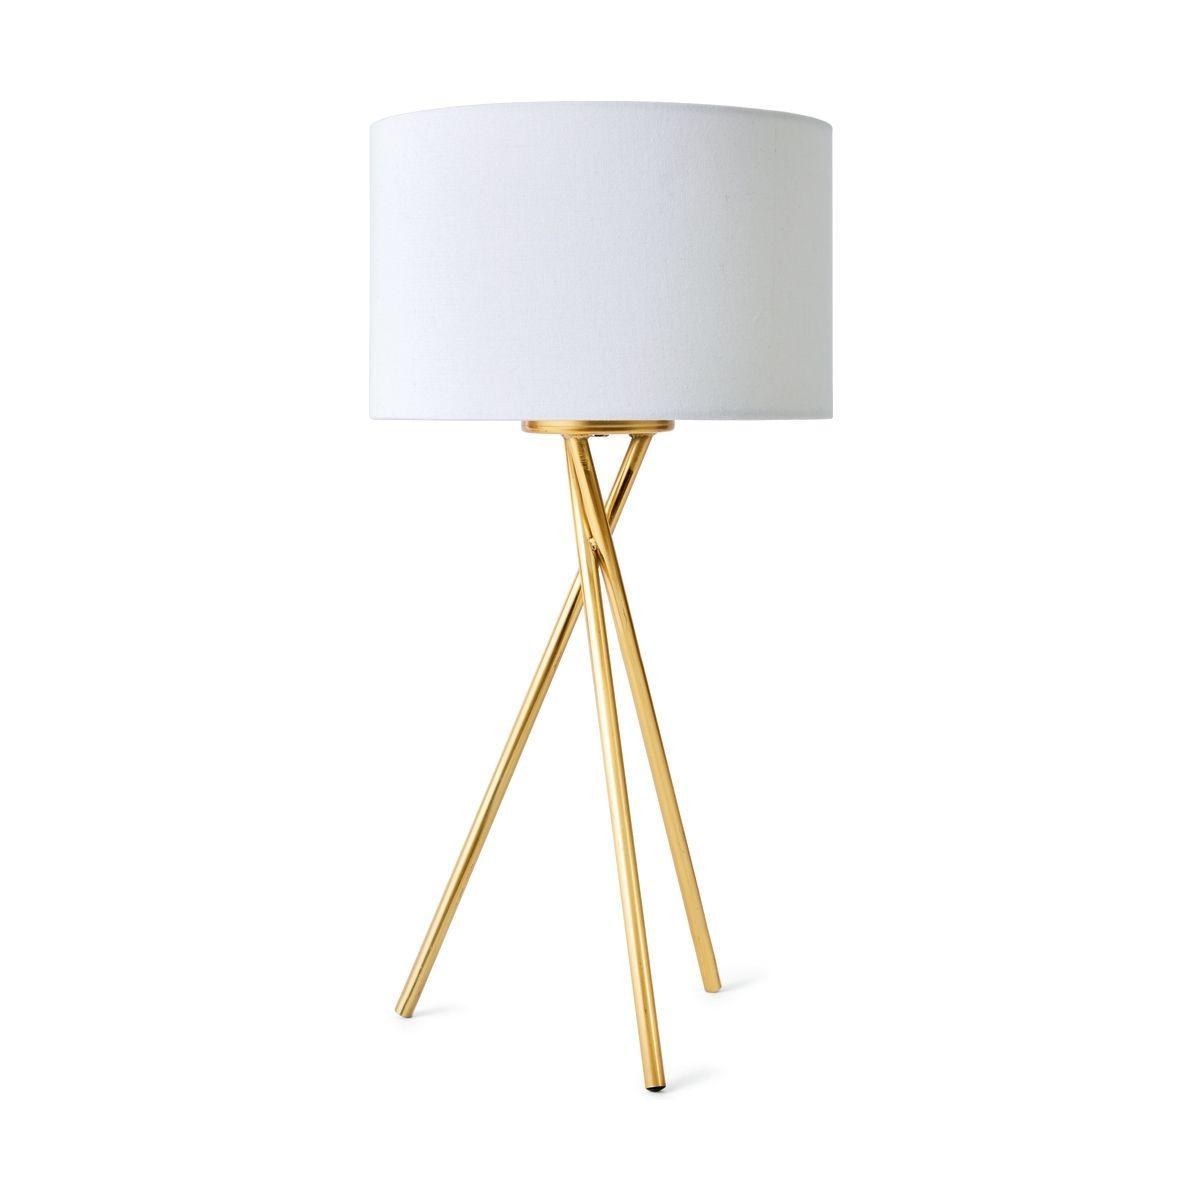 Tripod Table Lamp Brass Look Kmart Tripod Table Lamp Tripod